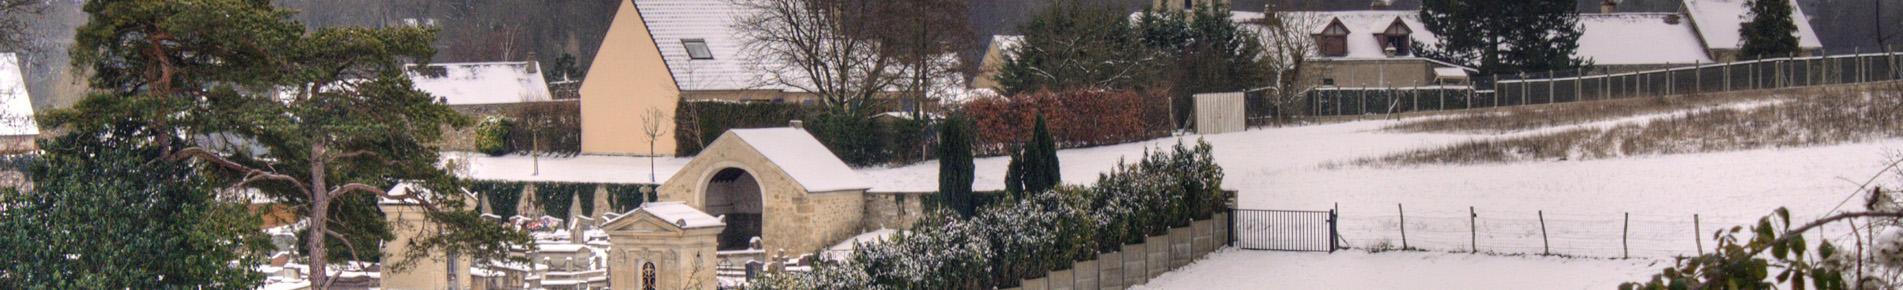 Diapo (sous la neige)